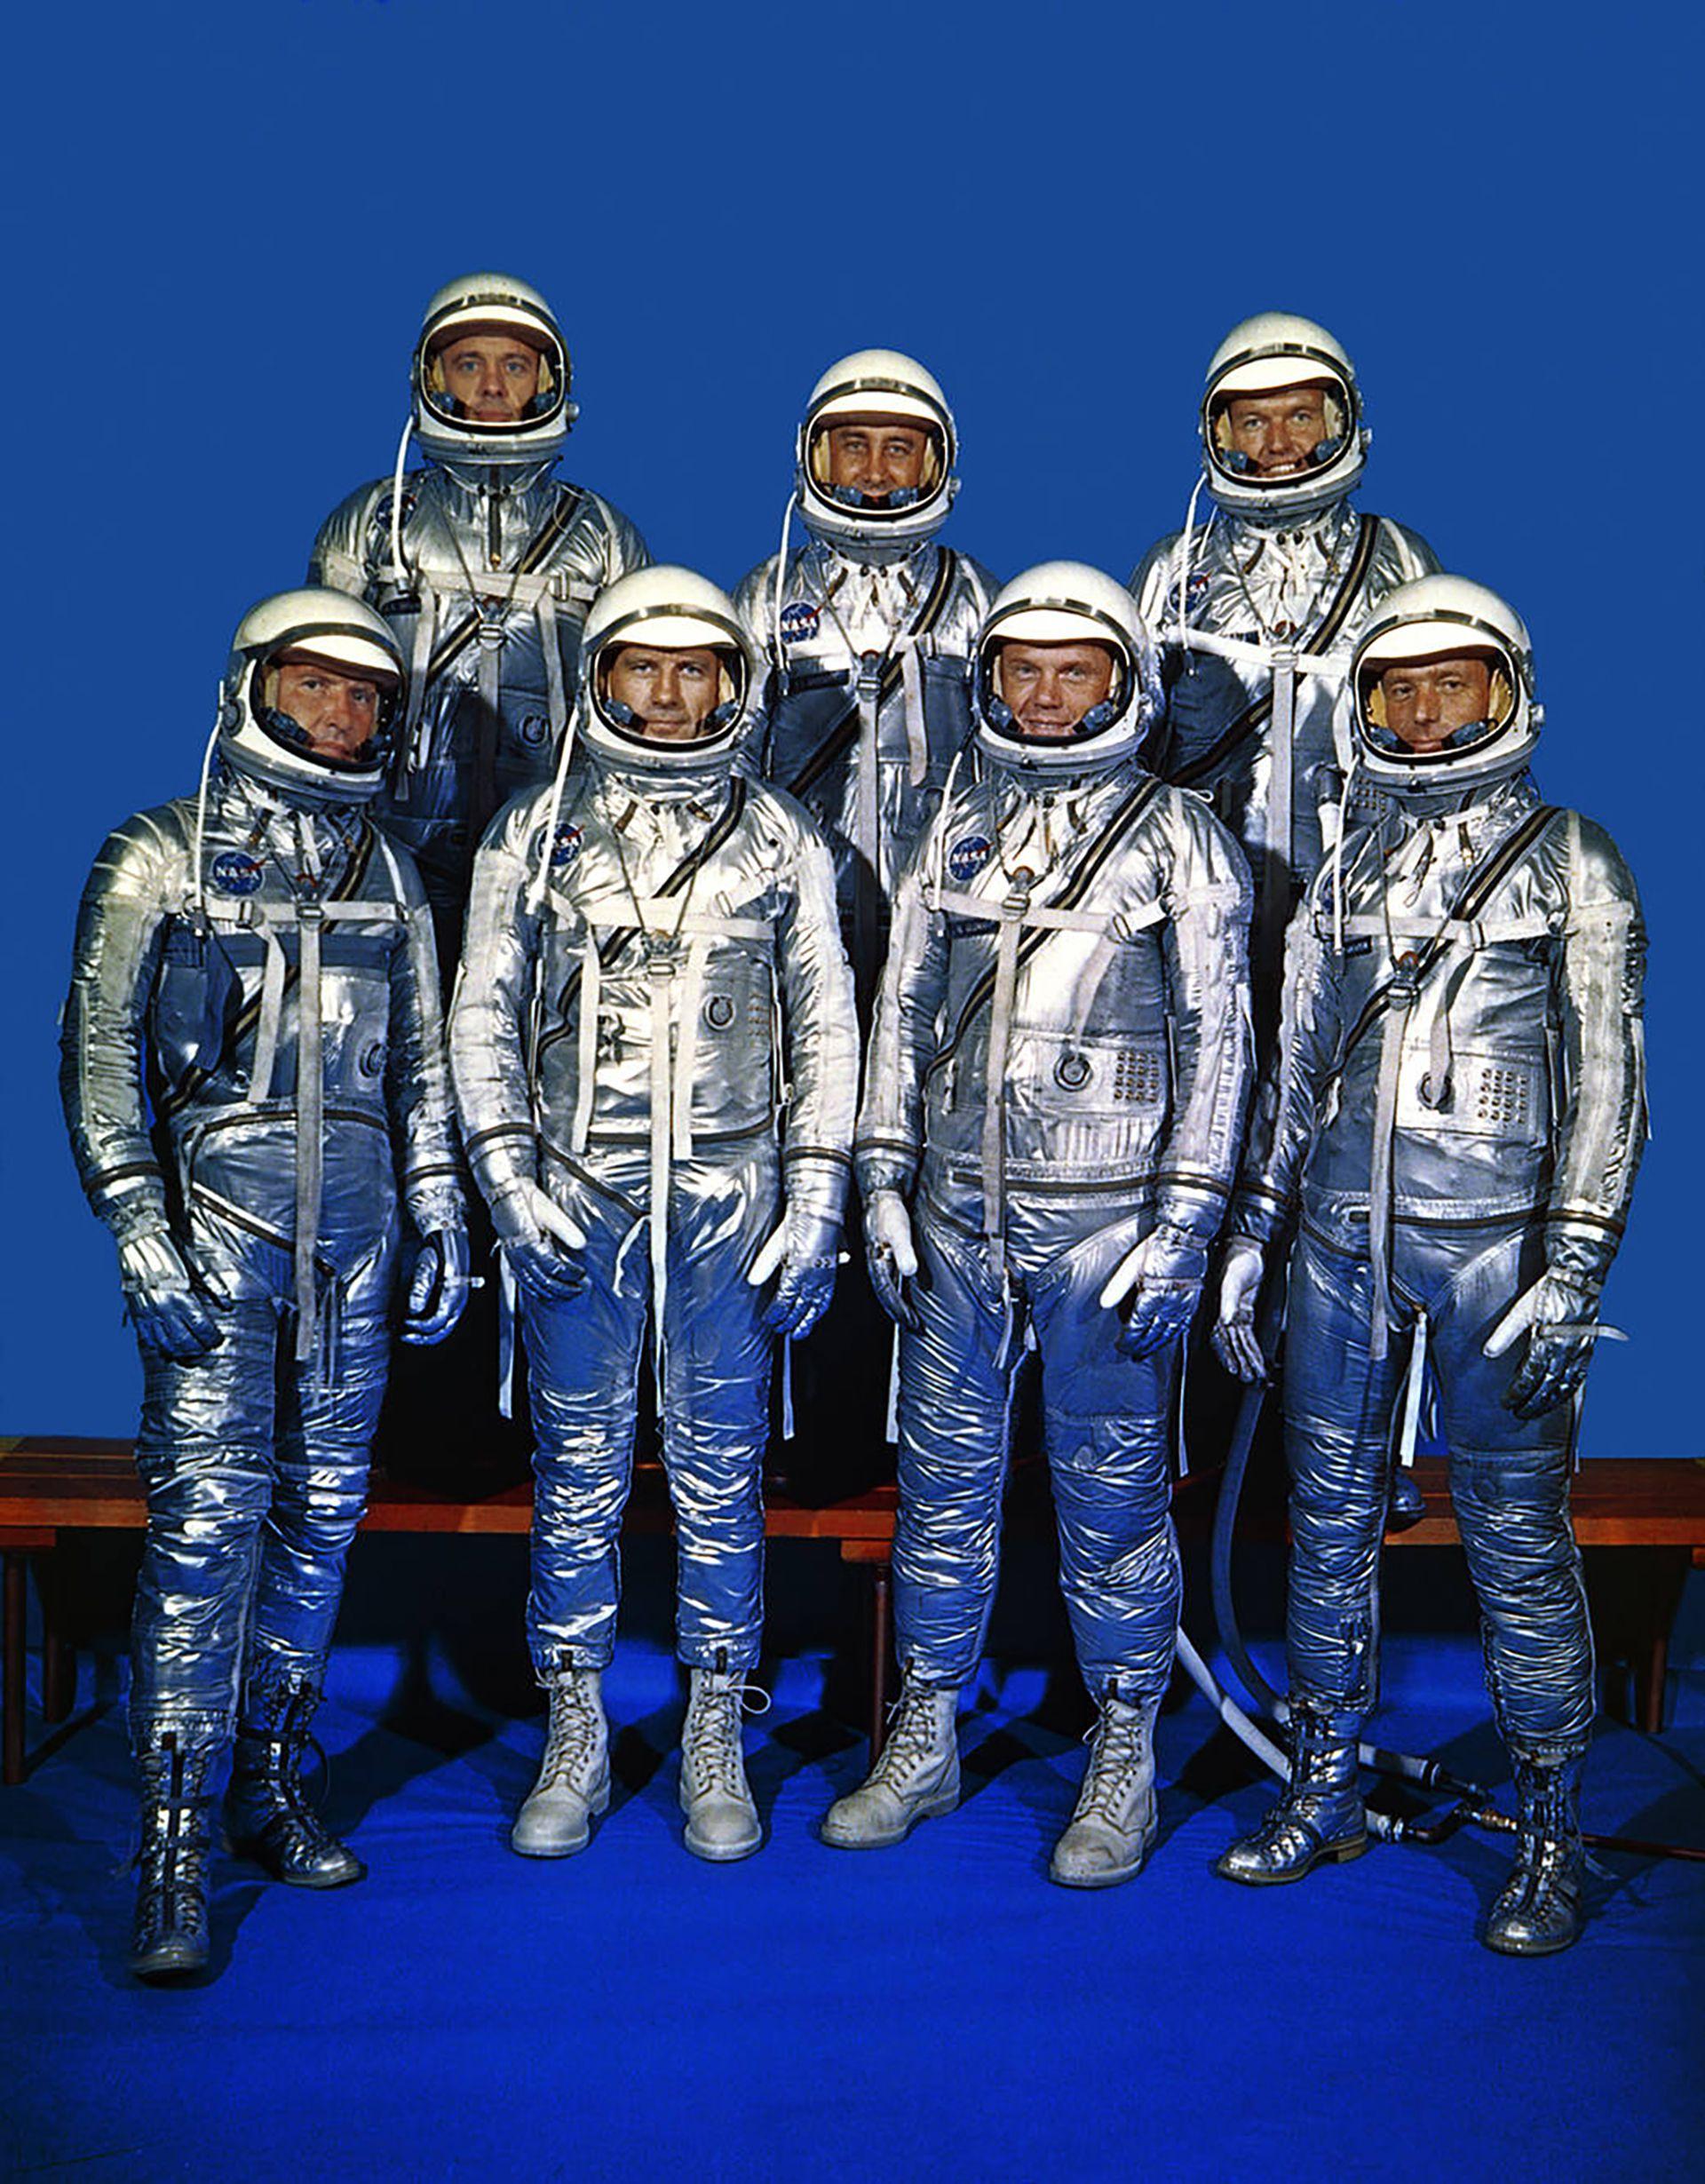 Los Siete de Mercury: Alan Shephard, Gus Grissom y Gordon Cooper, Walter Schirra, Deke Slayton, John Glenn y Scott Carpenter (NASA)